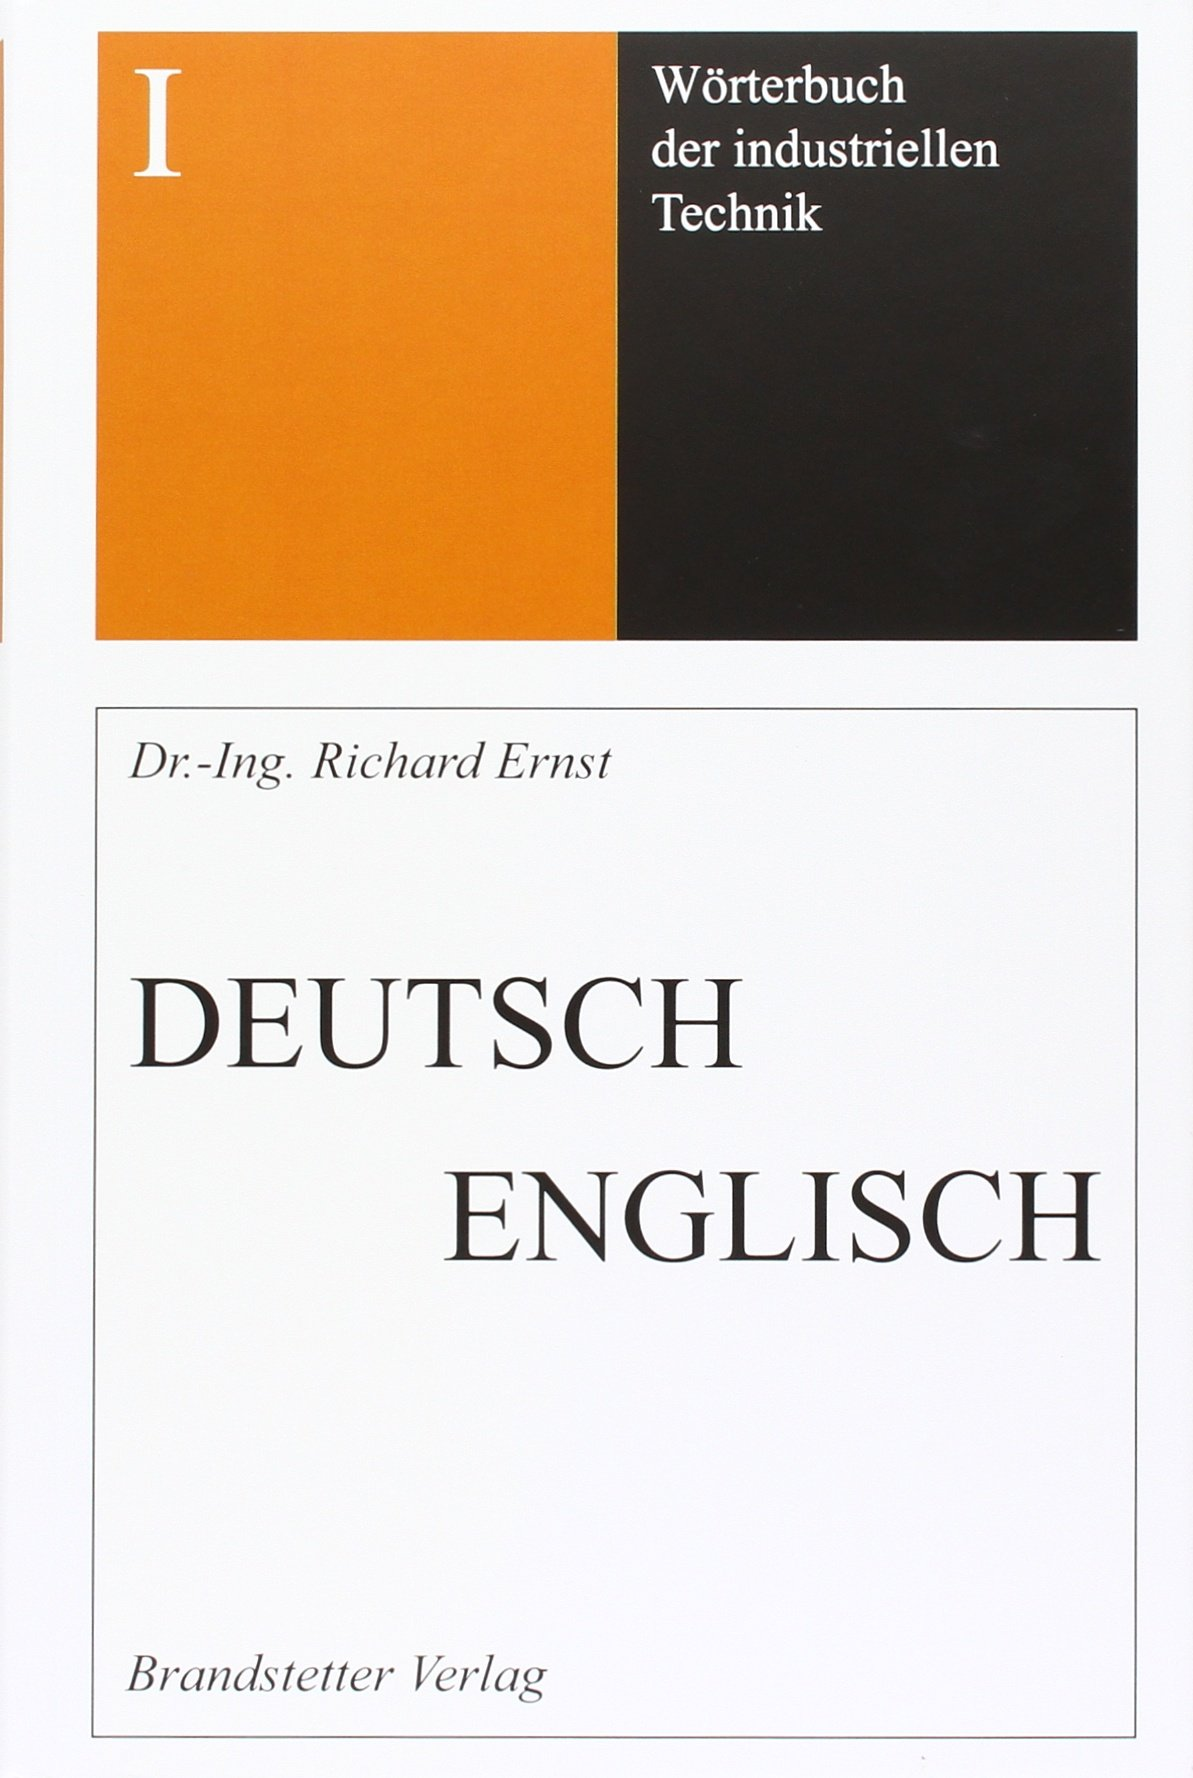 wrterbuch-der-industriellen-technik-band-1-deutsch-englisch-dictionary-of-engineering-and-technology-vol-1-german-english